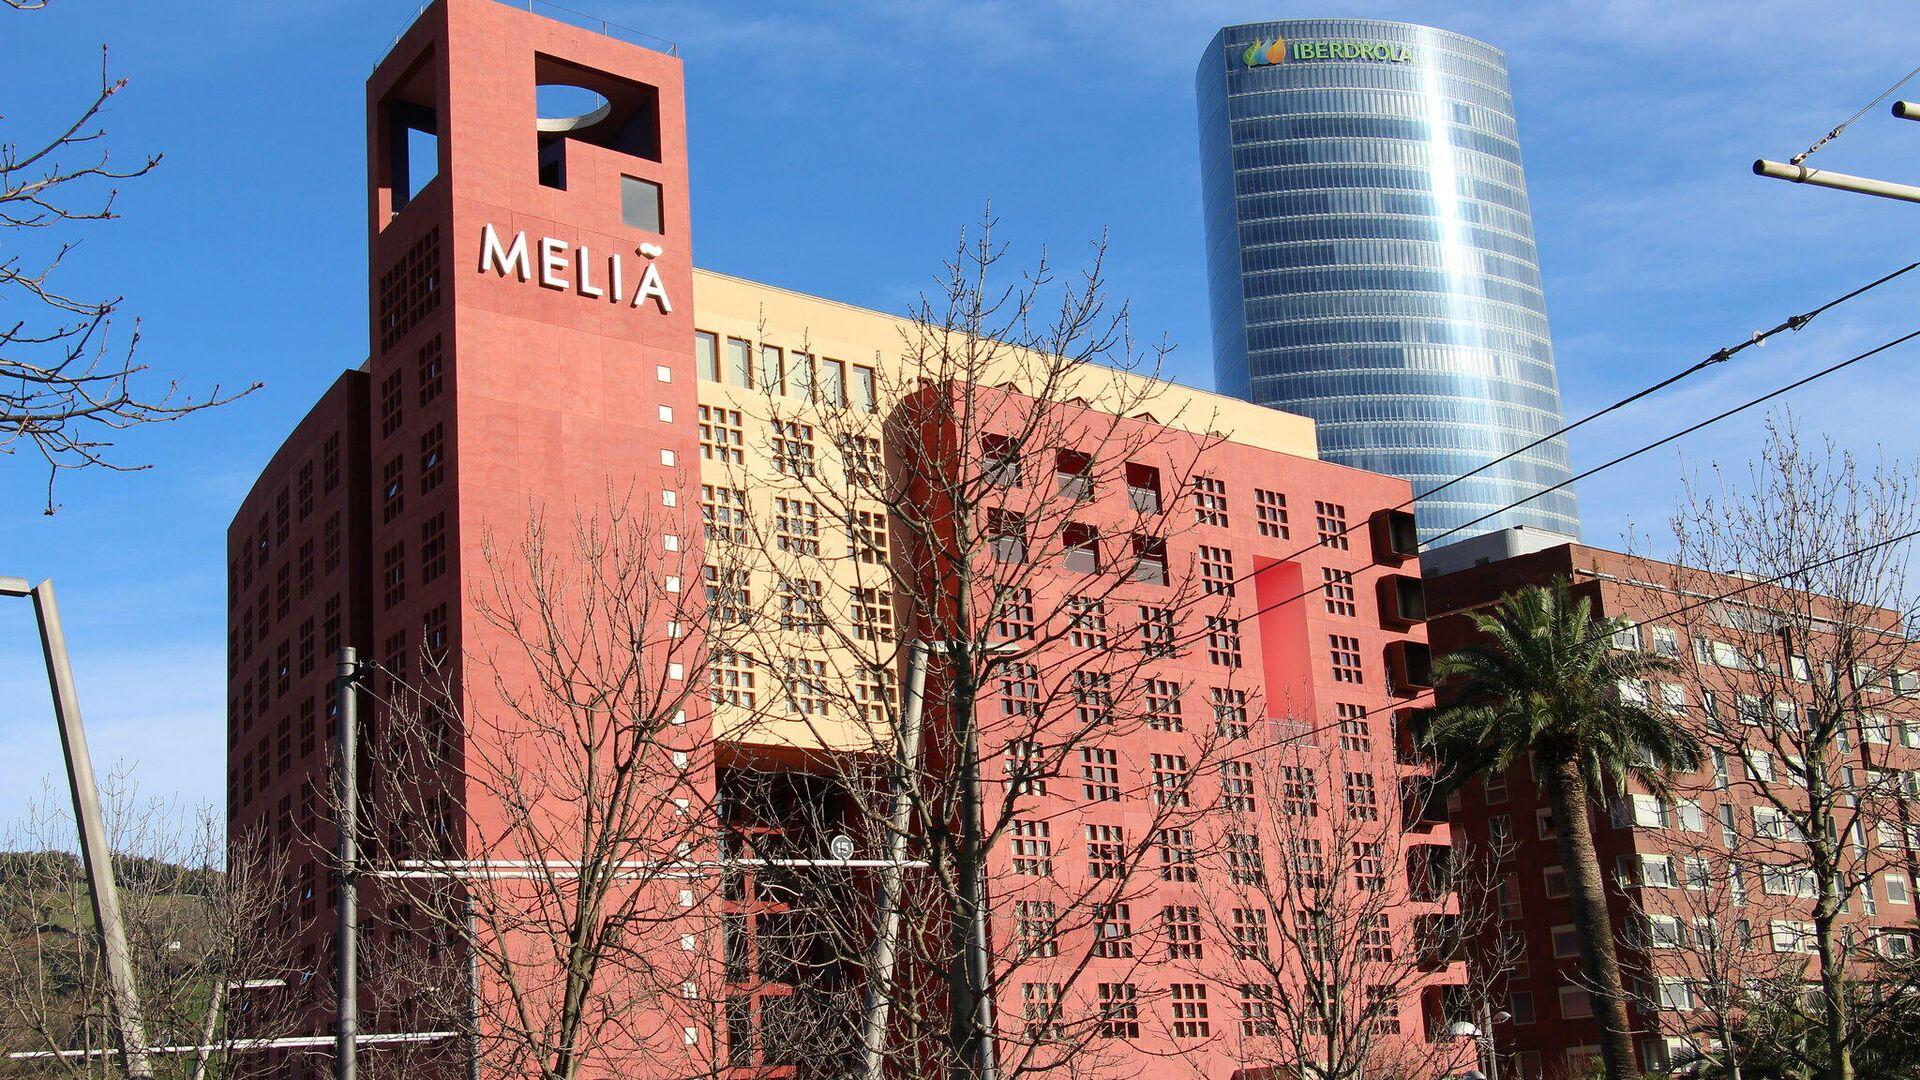 Hotel Meliá Bilbao, en Bilbao - Sputnik Mundo, 1920, 17.03.2021